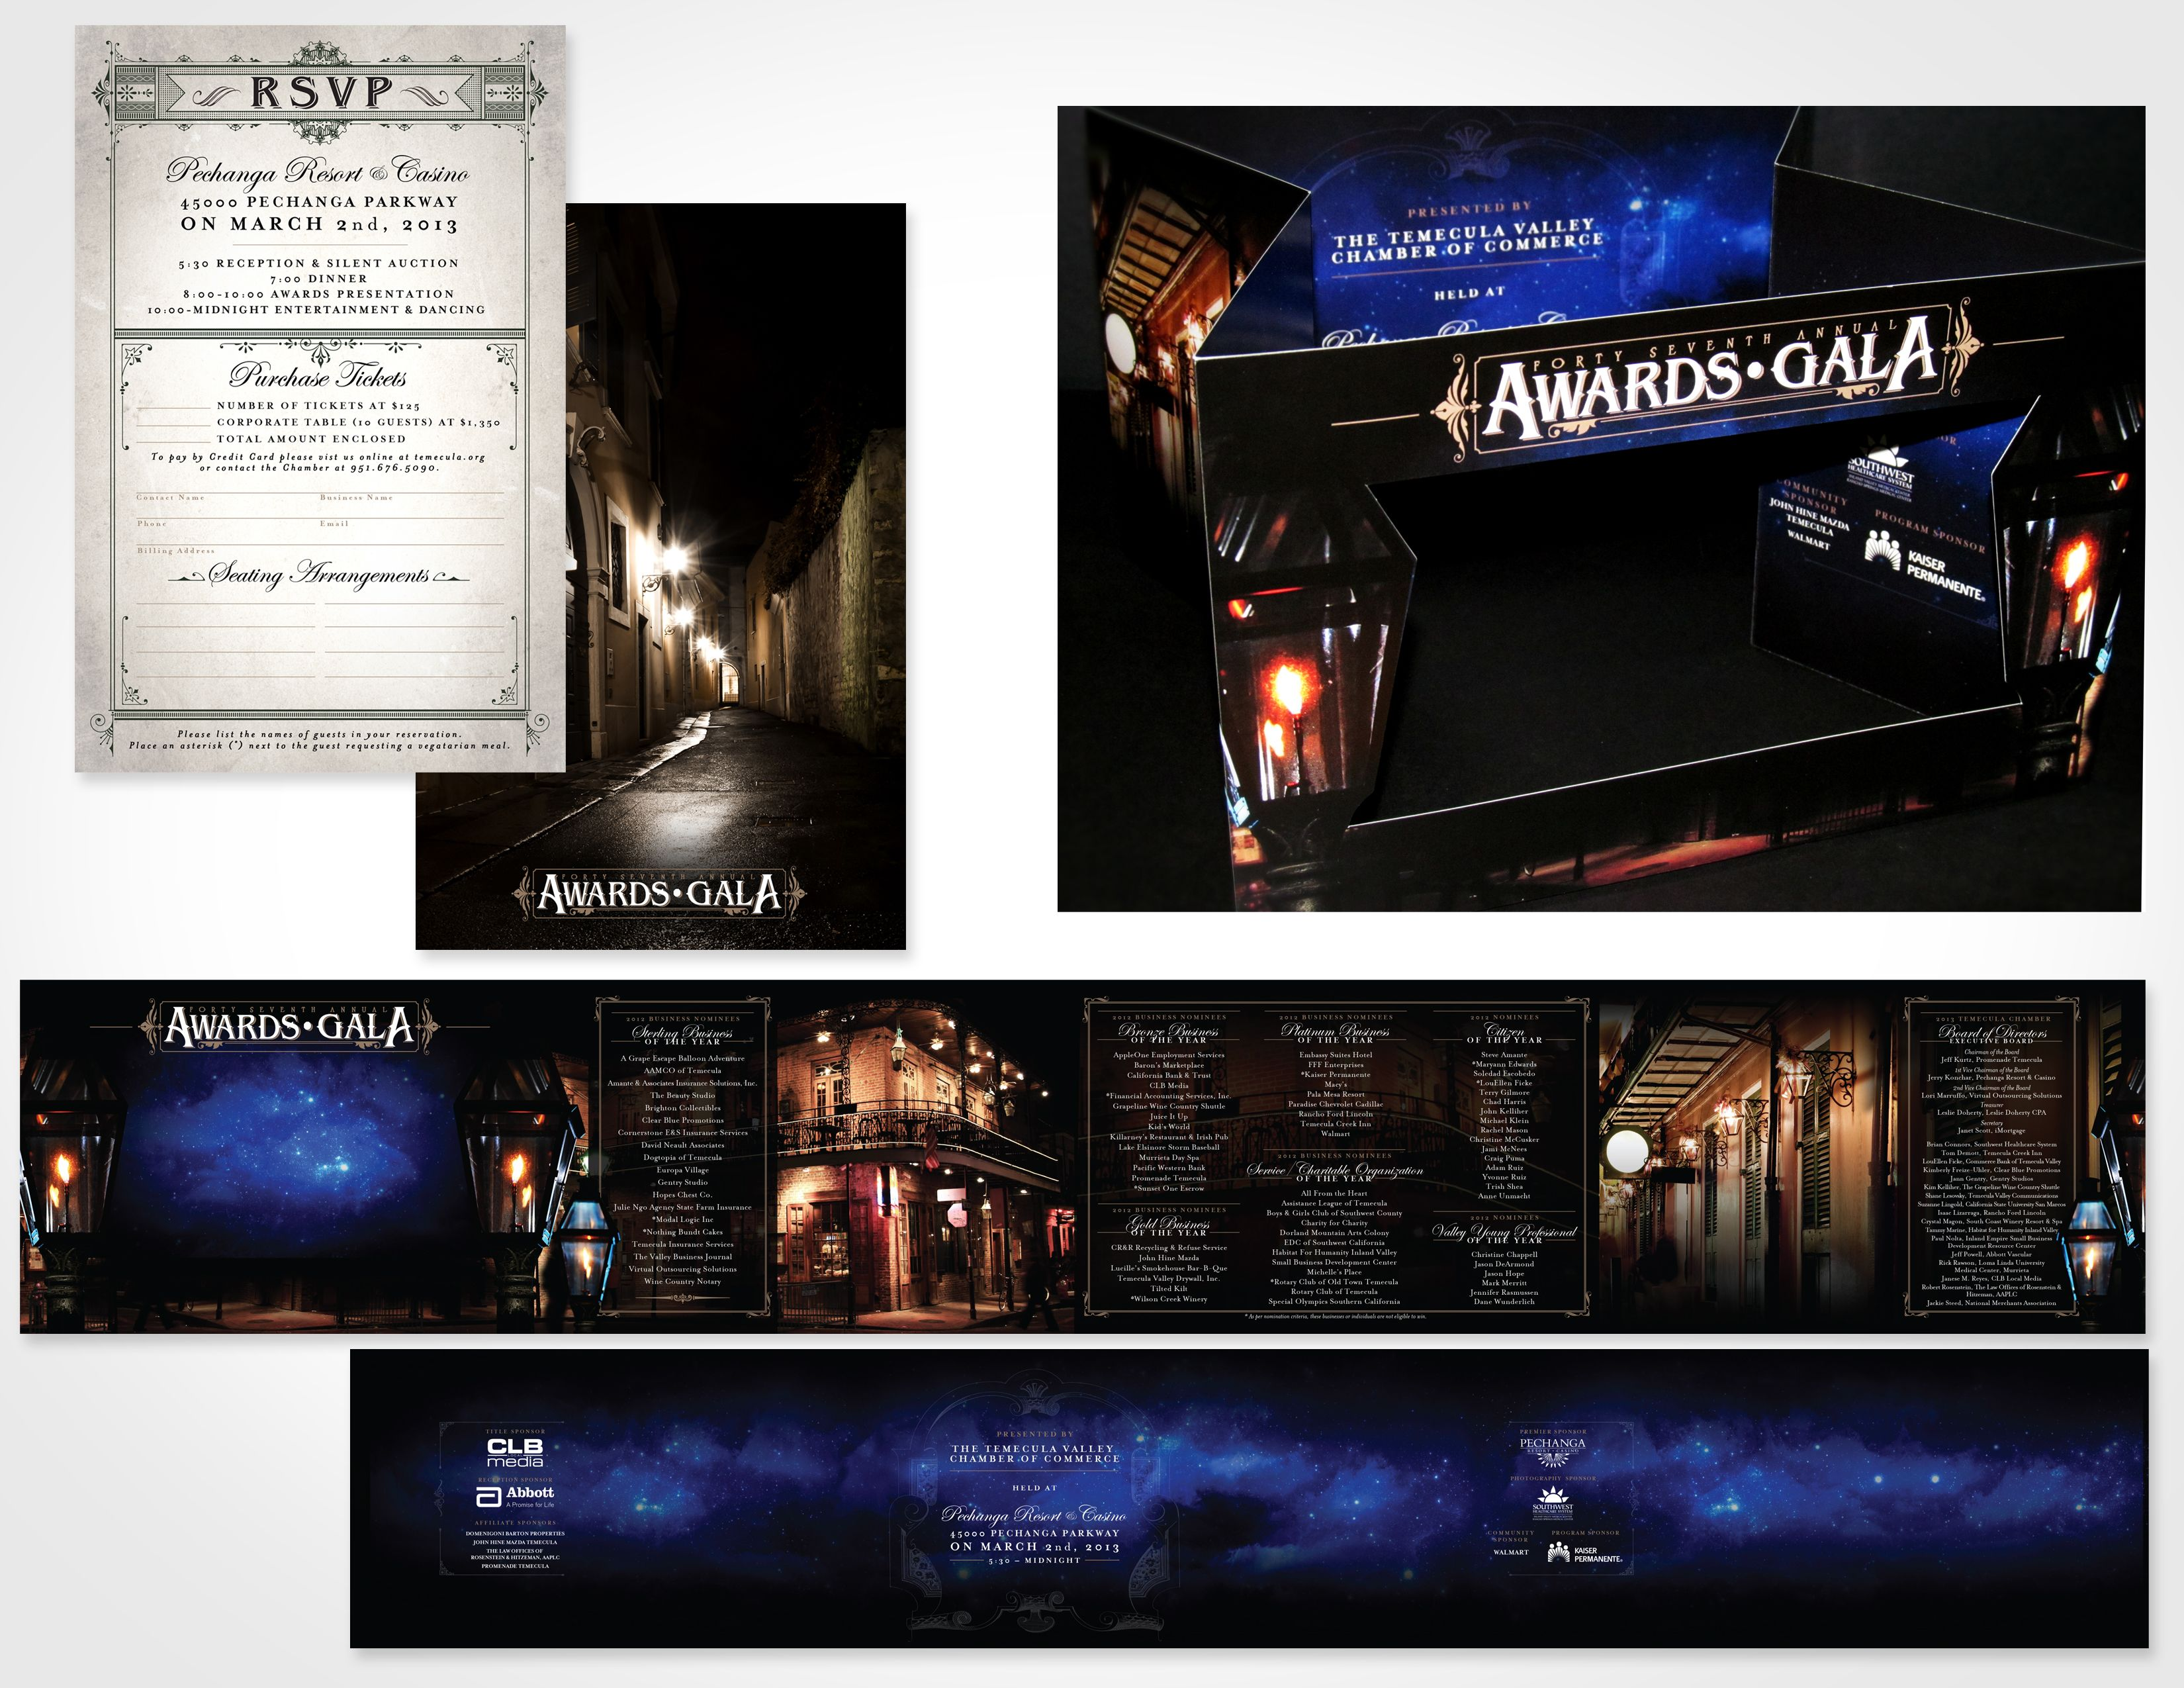 Temecula Chamber Awards Gala Invitation Shadow Box New Orleans